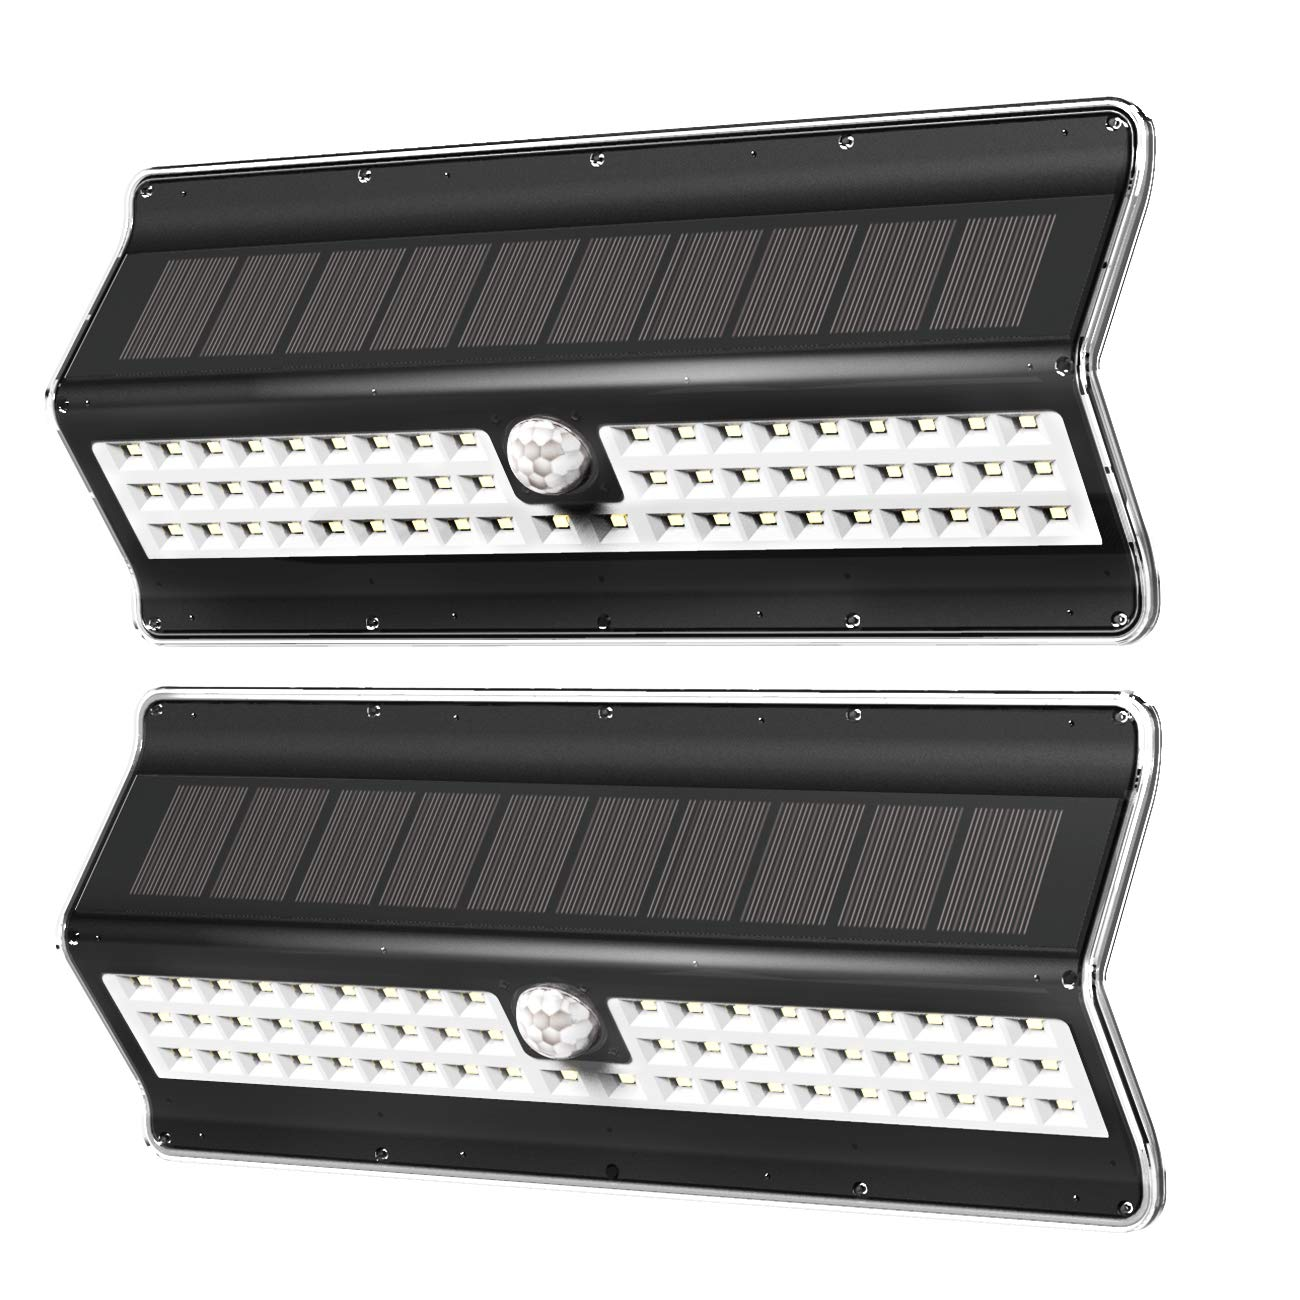 EZBASICS Solar Lights Outdoor 56 LED, Solar Motion Sensor Light Outdoor, Waterproof Wall Light, Wireless Security Night Light, Black Shape, 2 Pack